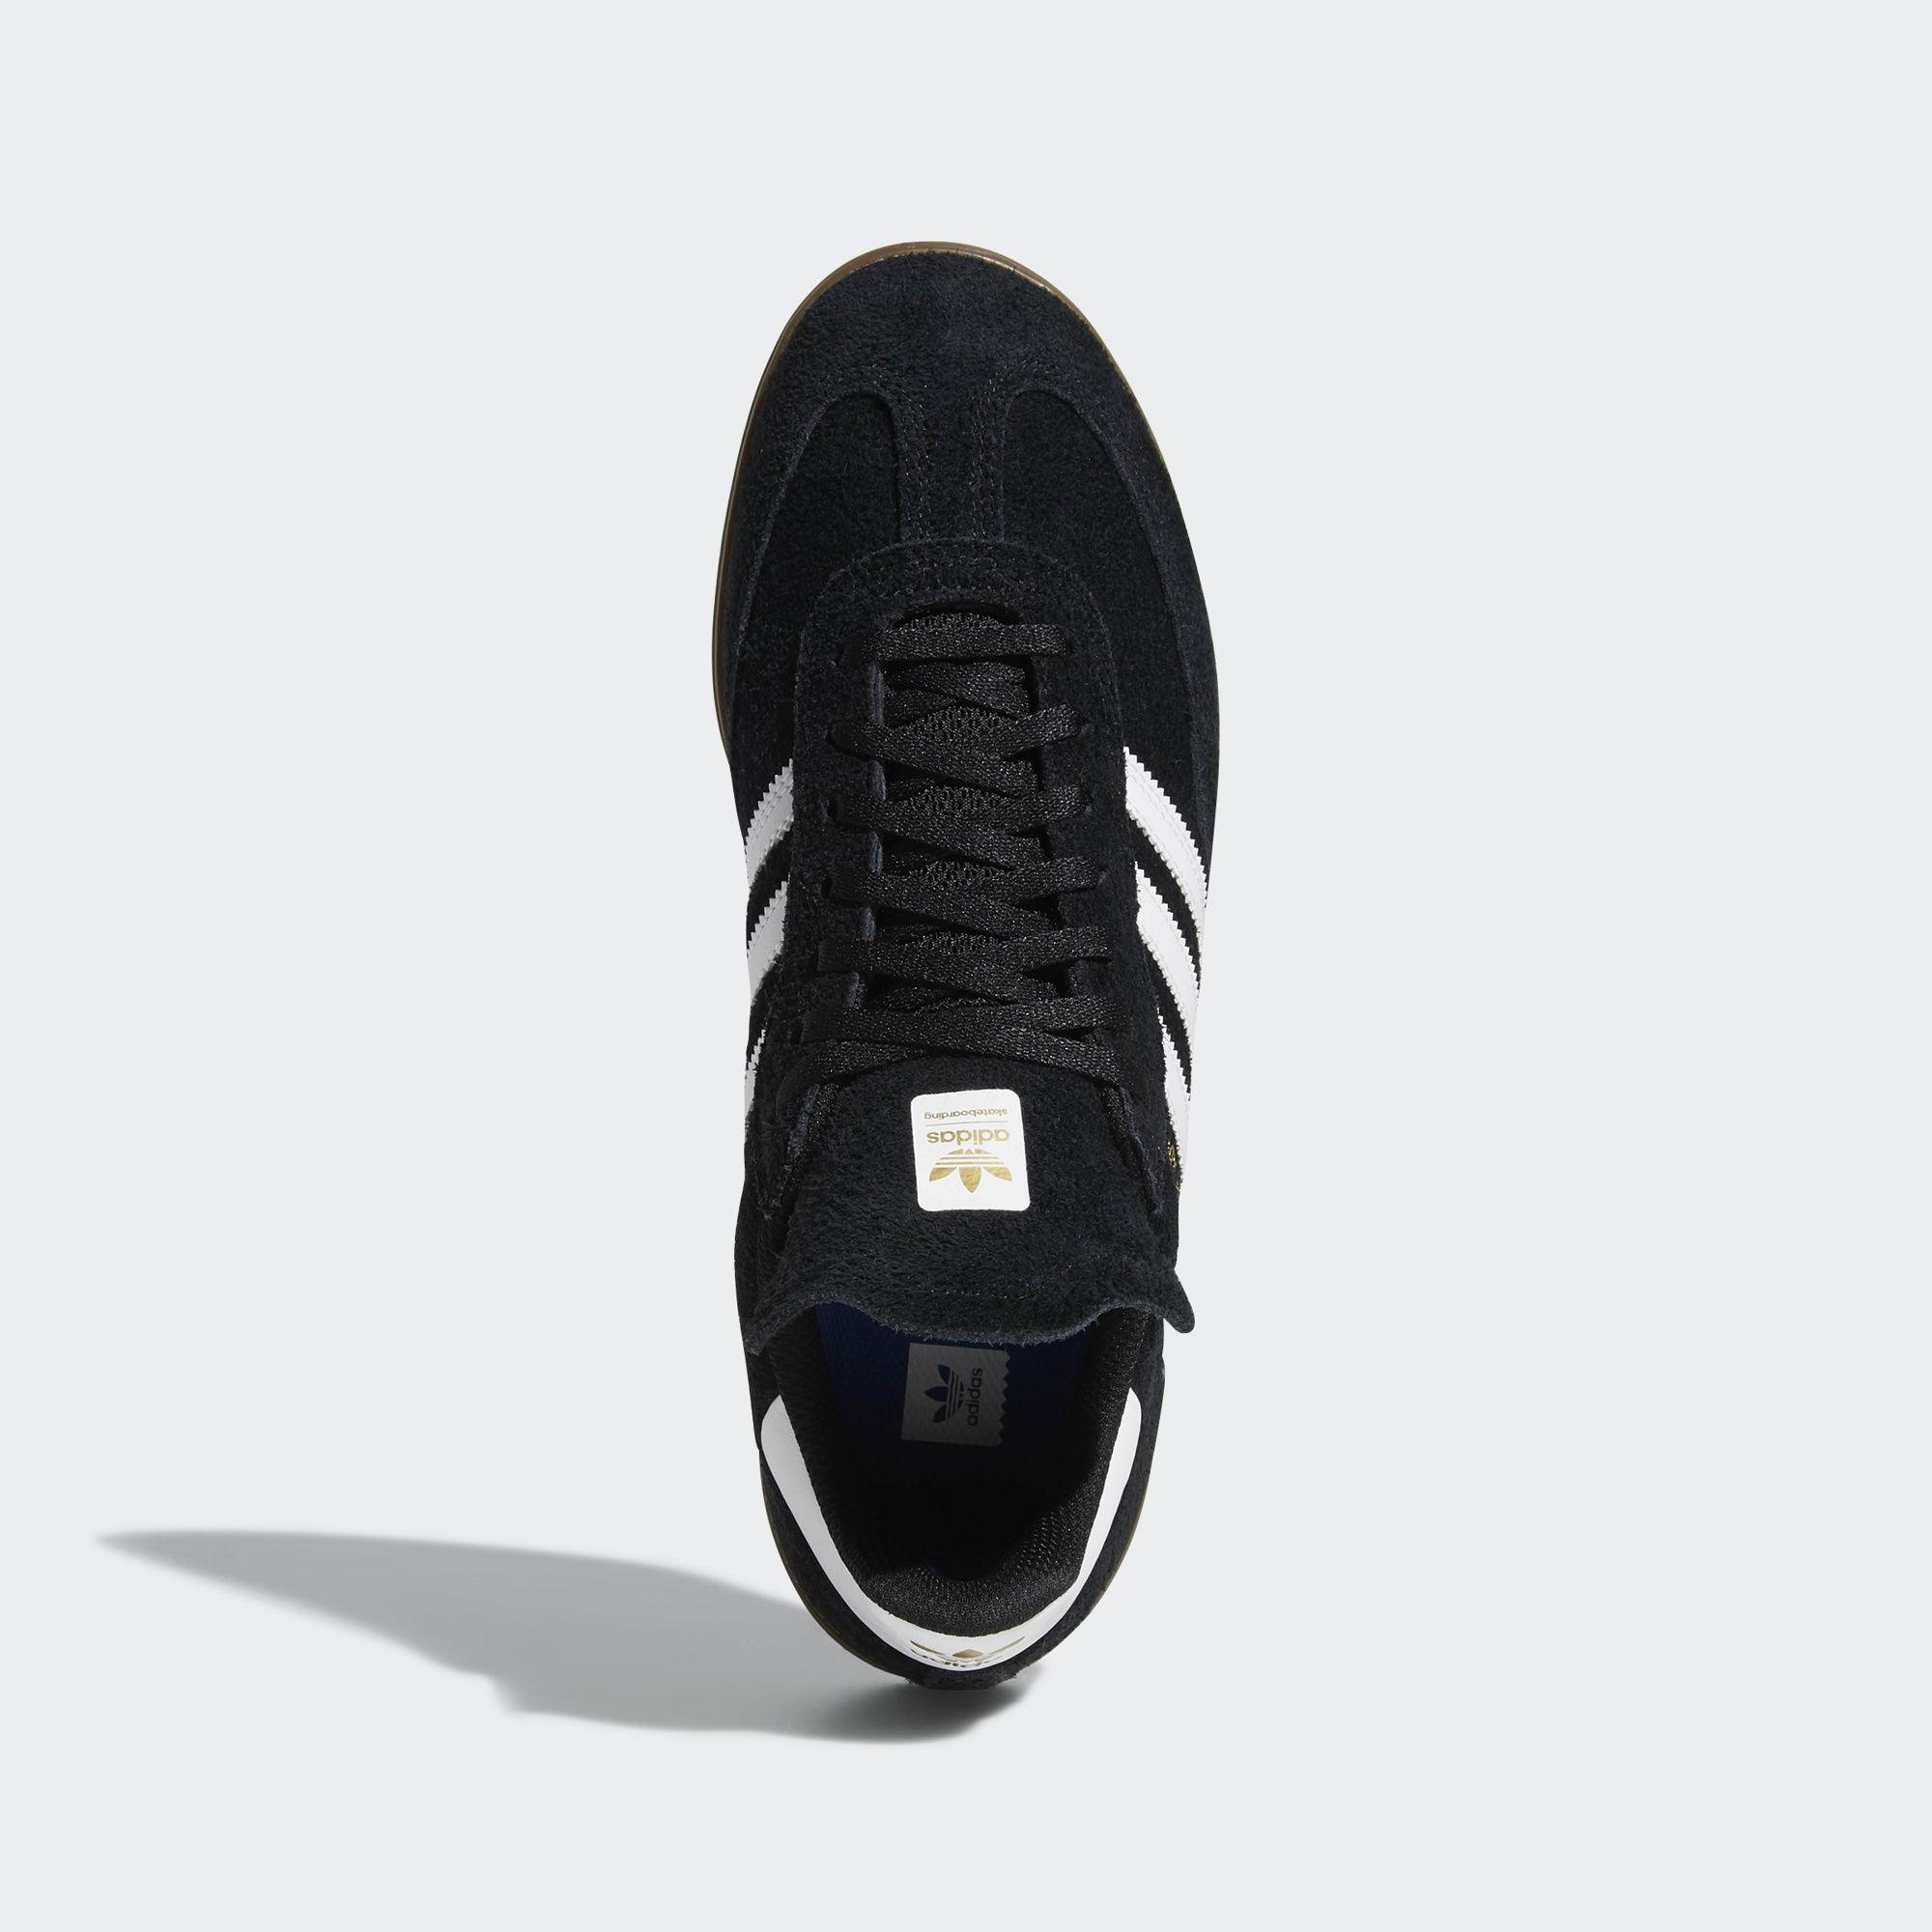 a980cd9bf Adidas - Black Samba Adv Shoes - Lyst. View fullscreen